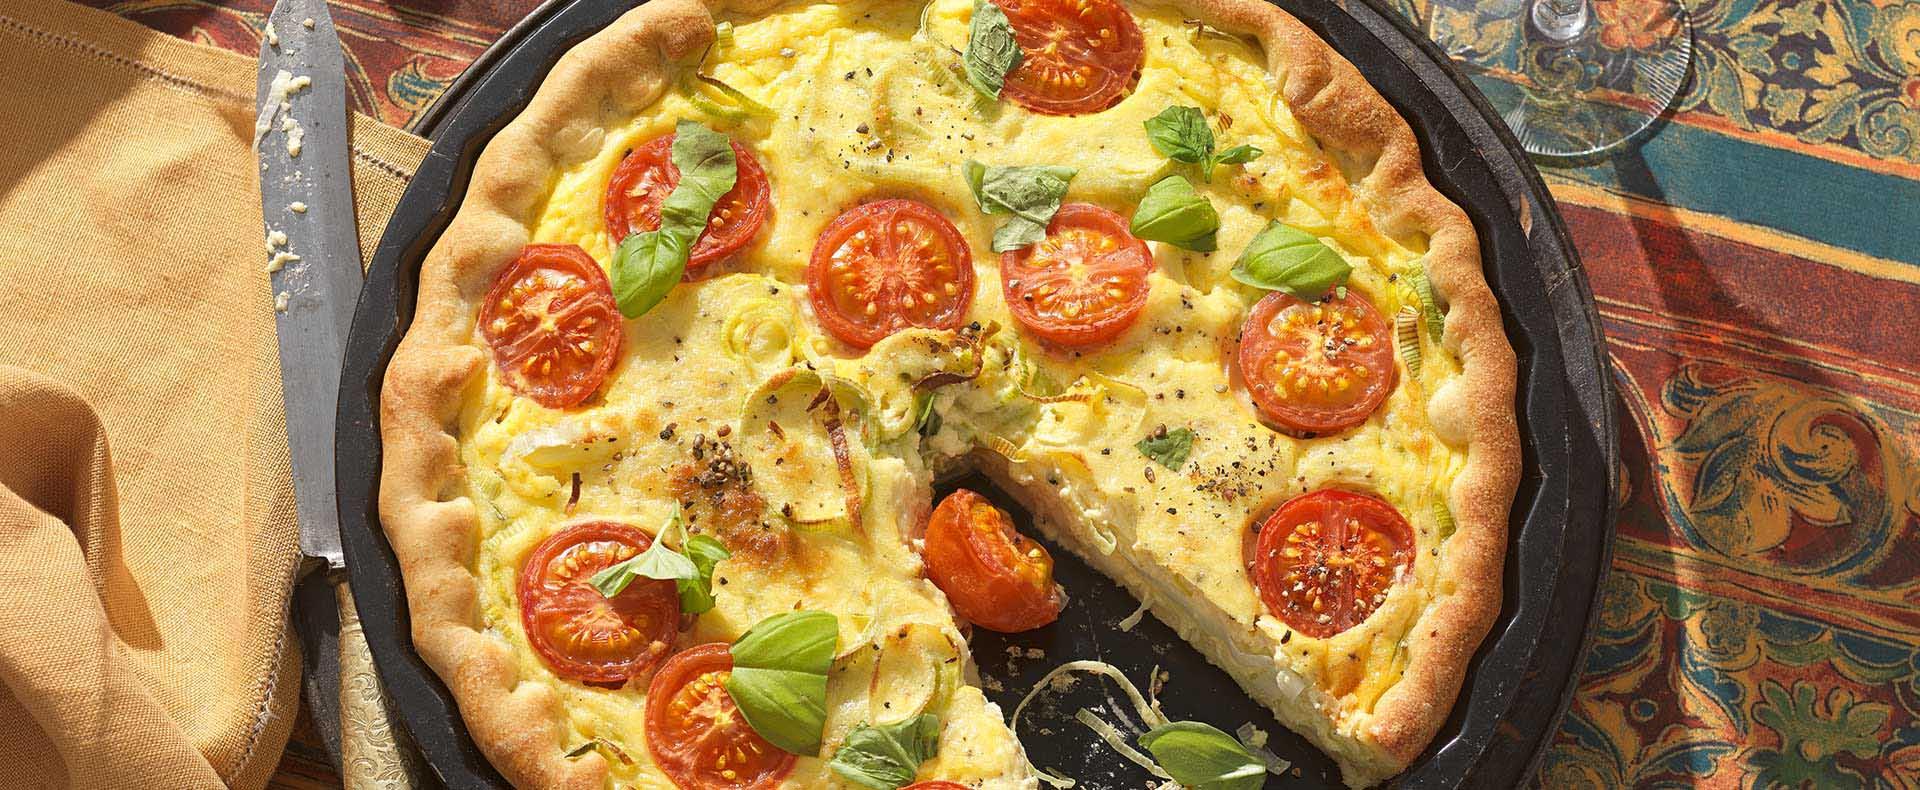 Pizzawähe Lauch Käse Tante Fanny